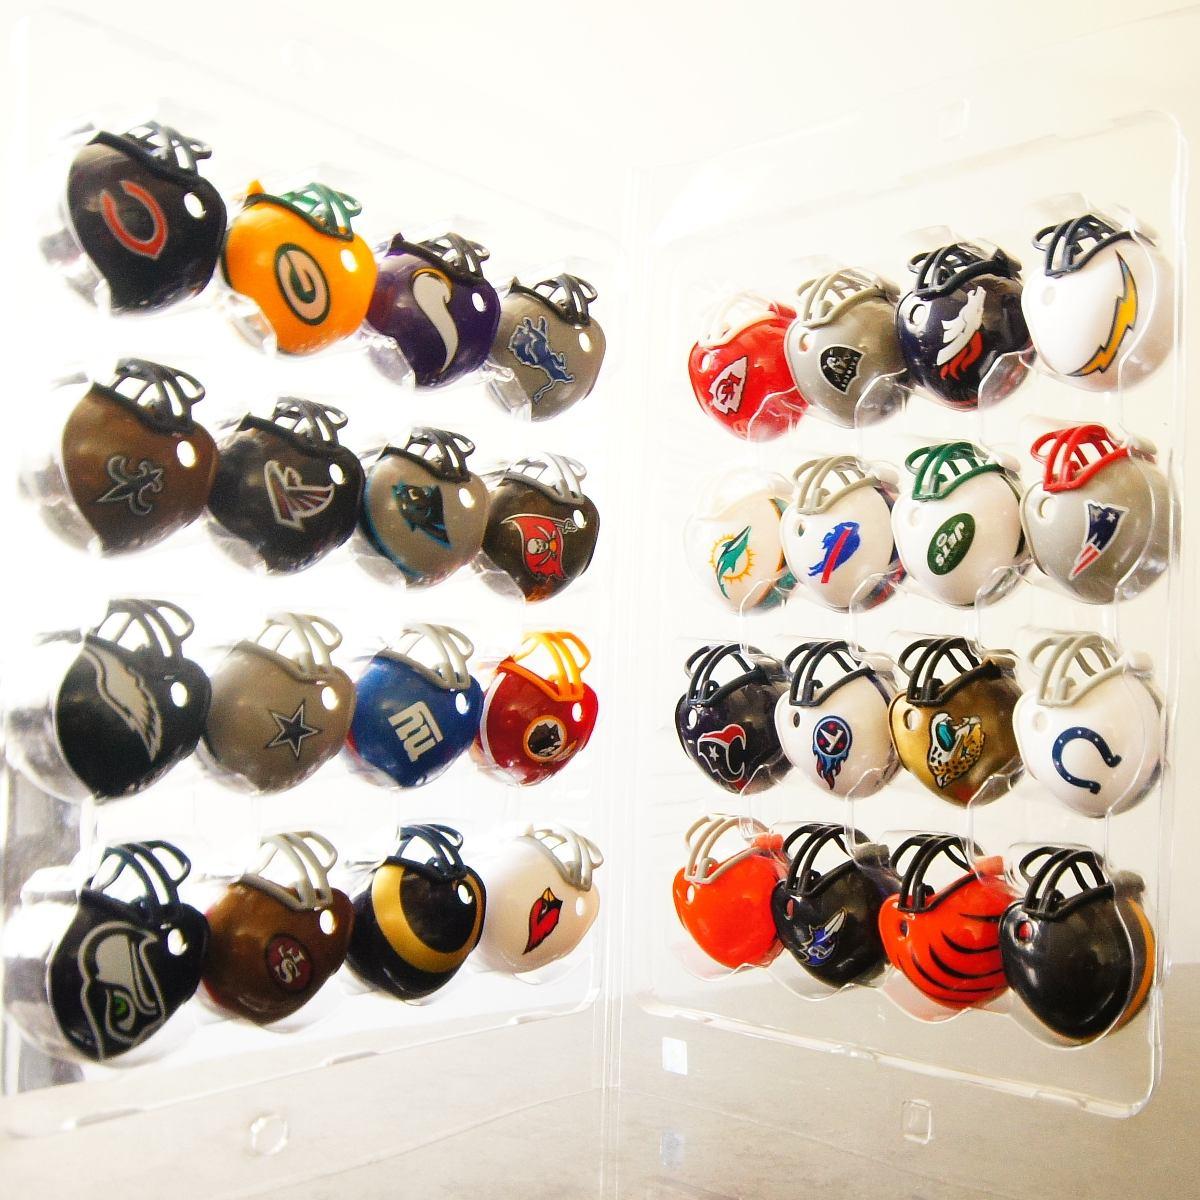 mini capacete futebol americano nfl - coleção completa. Carregando zoom. bcd14f47c88ff